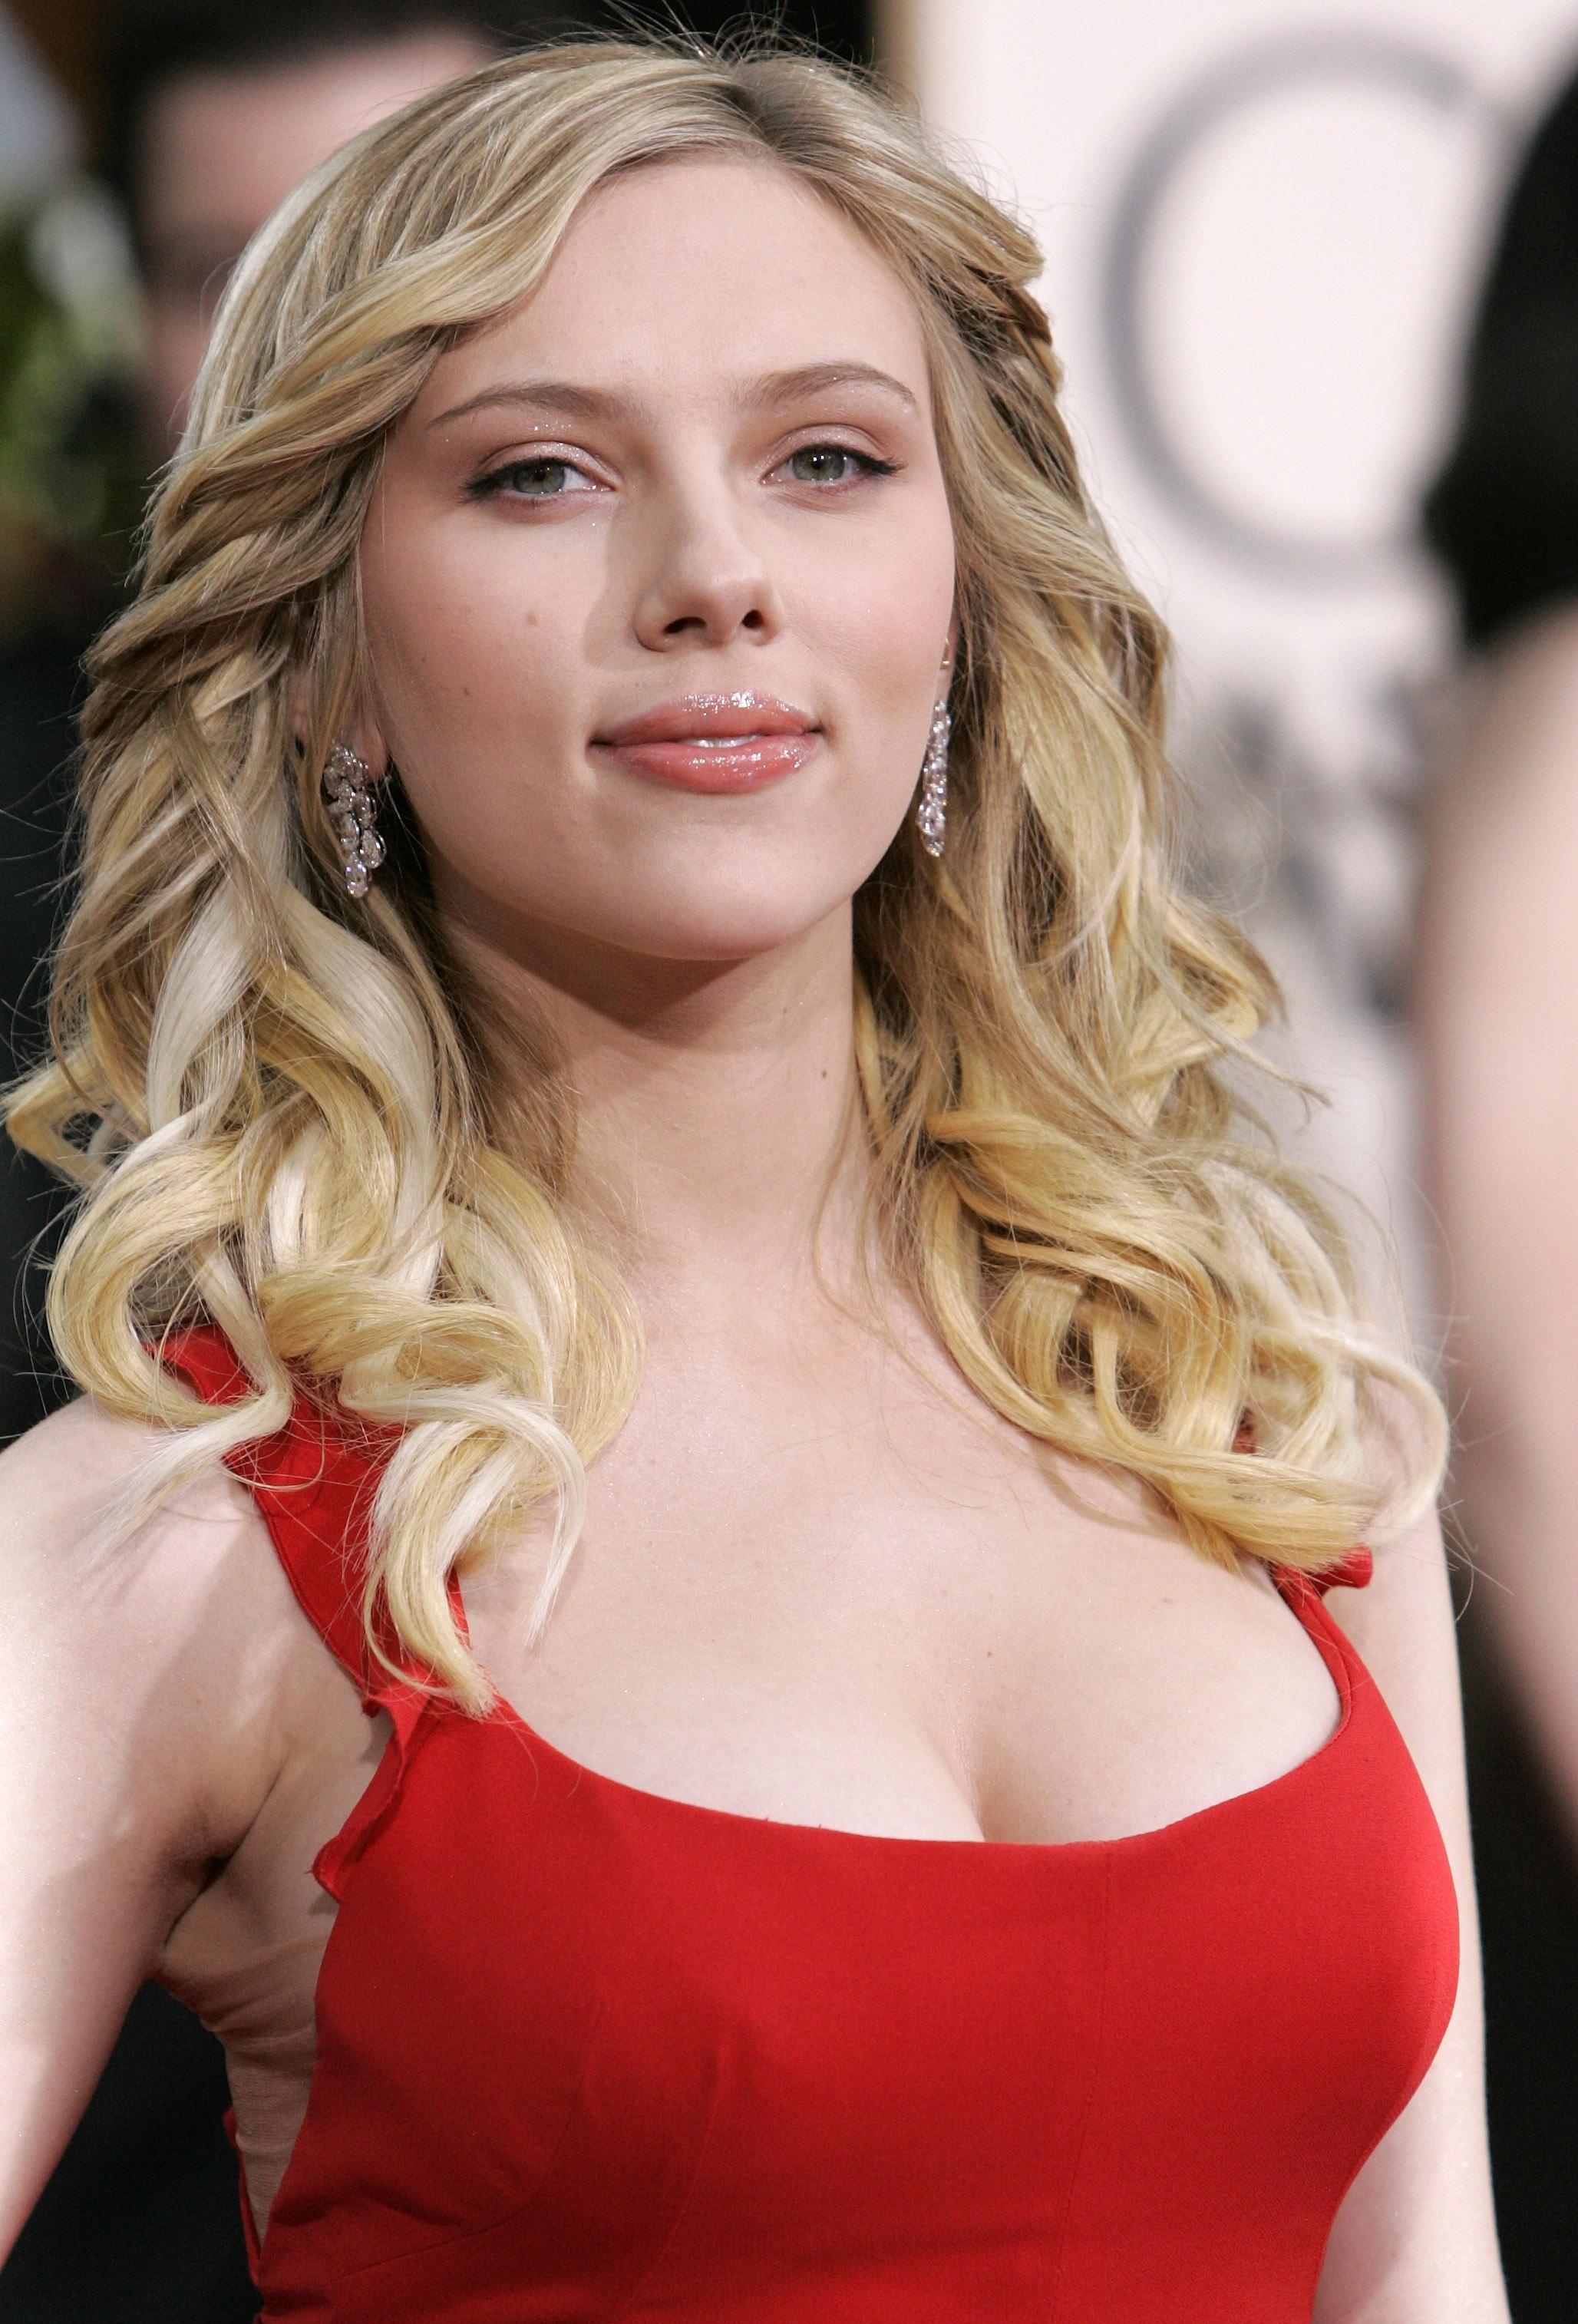 Scarlett johansson red dress wallpaper